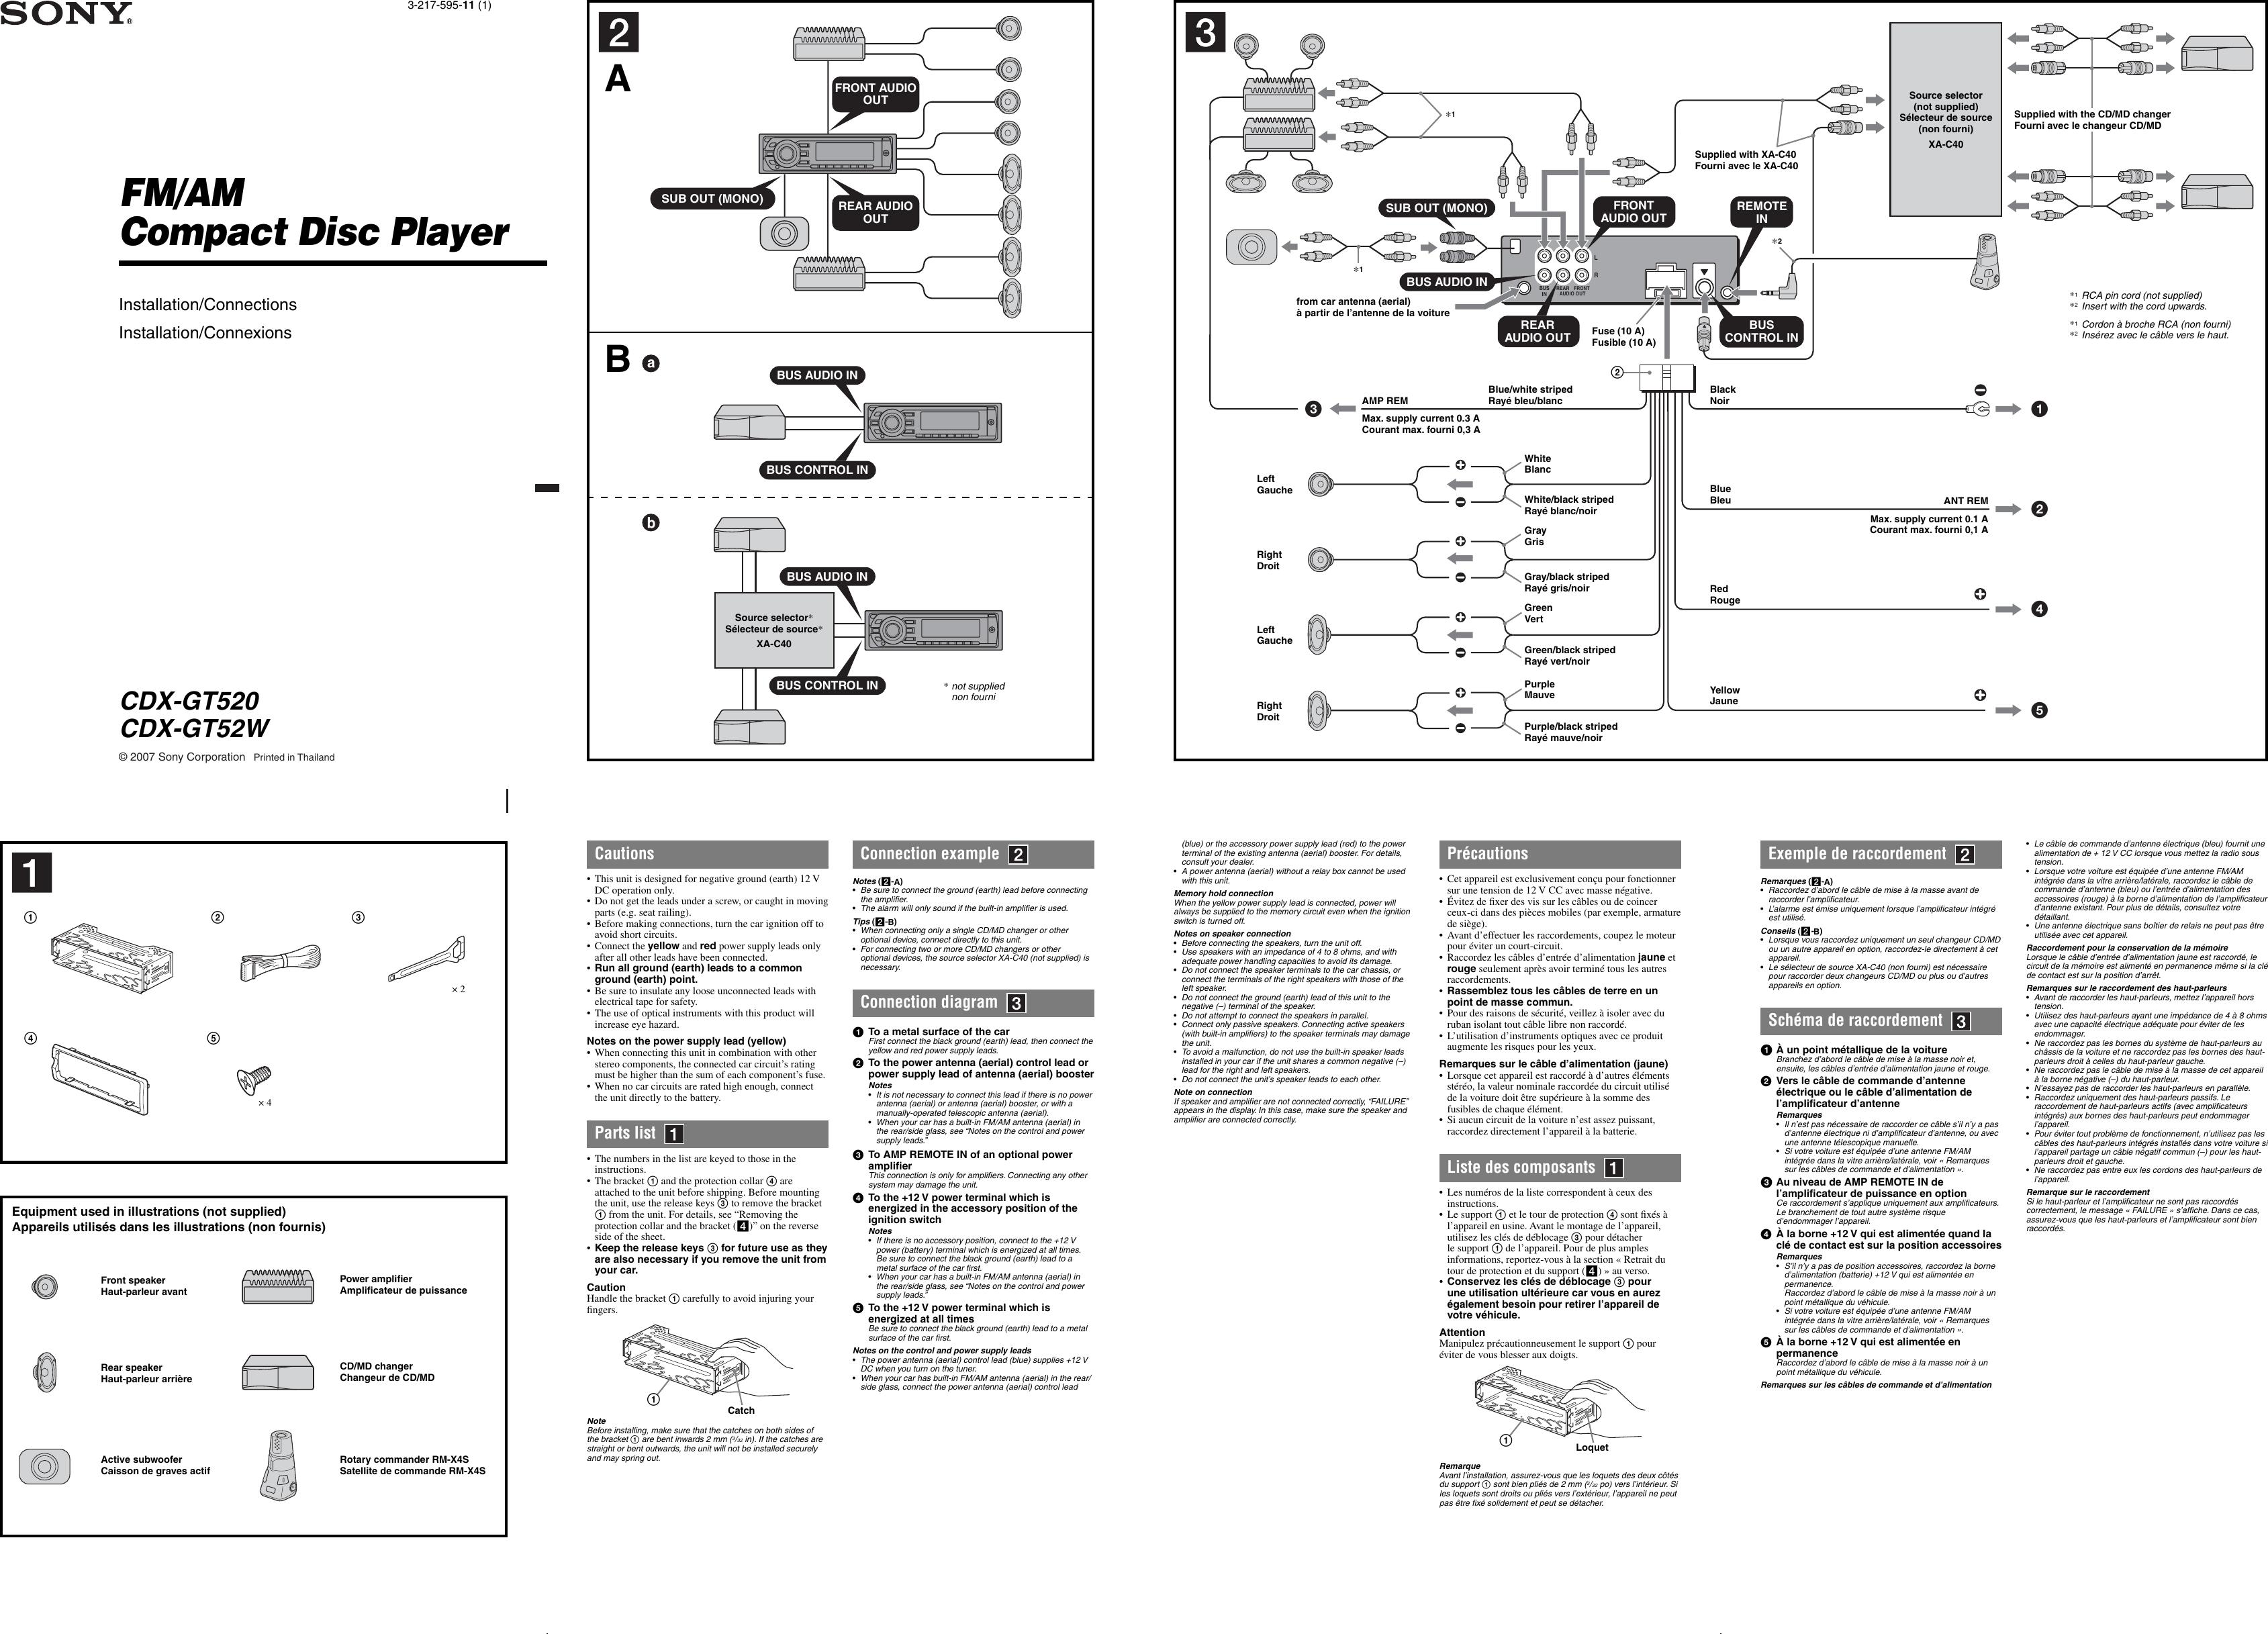 Sony Cdx Gt520 Wiring Diagram from usermanual.wiki